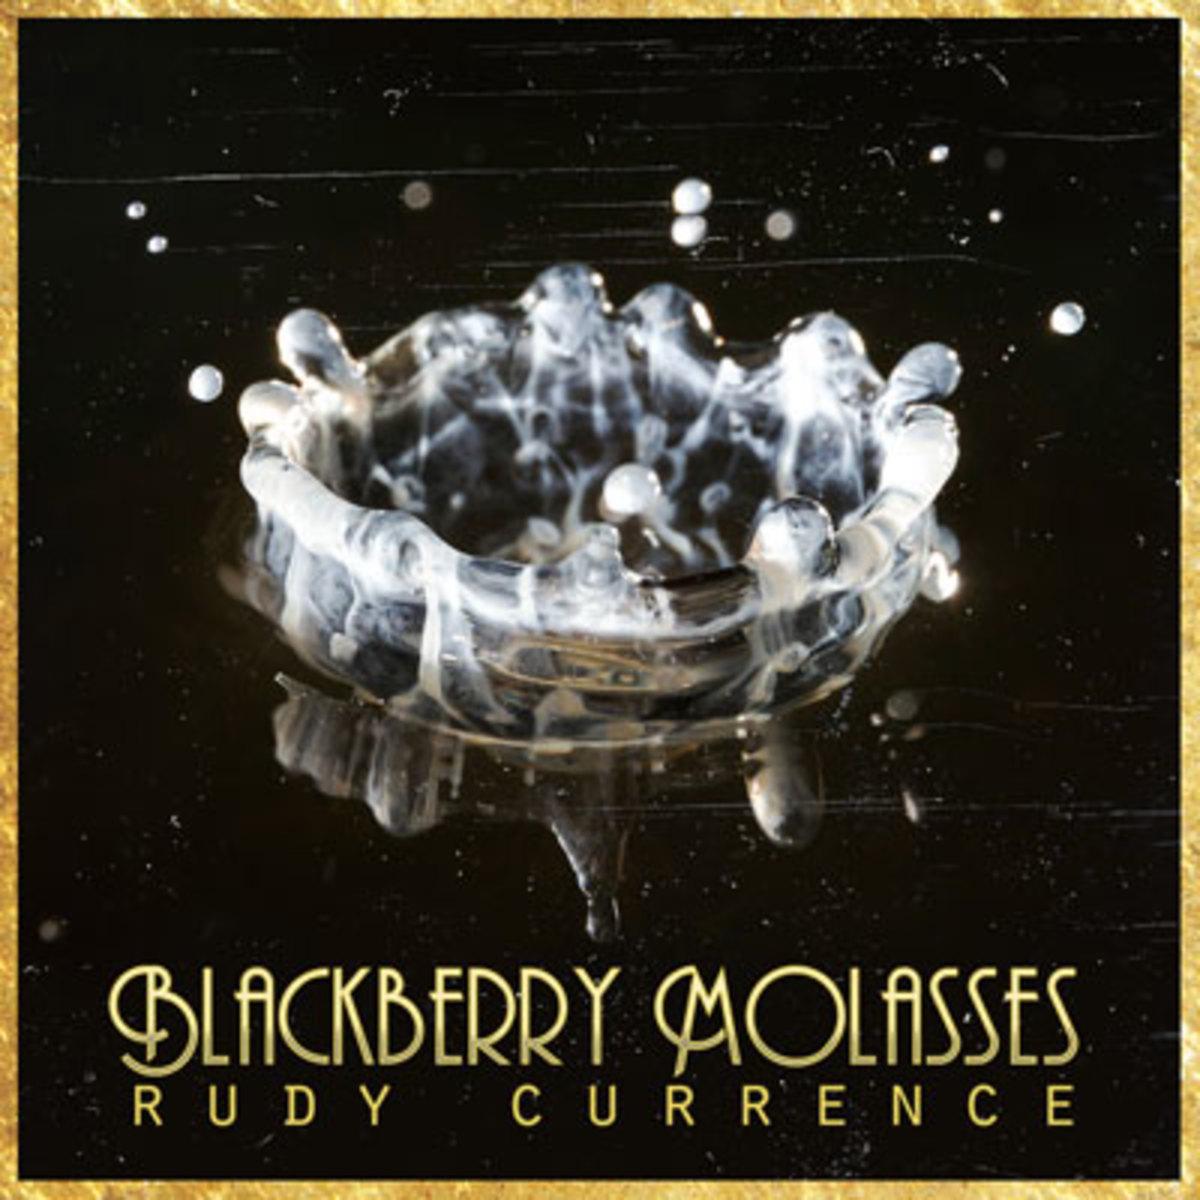 rudycurr-blackberrymol.jpg